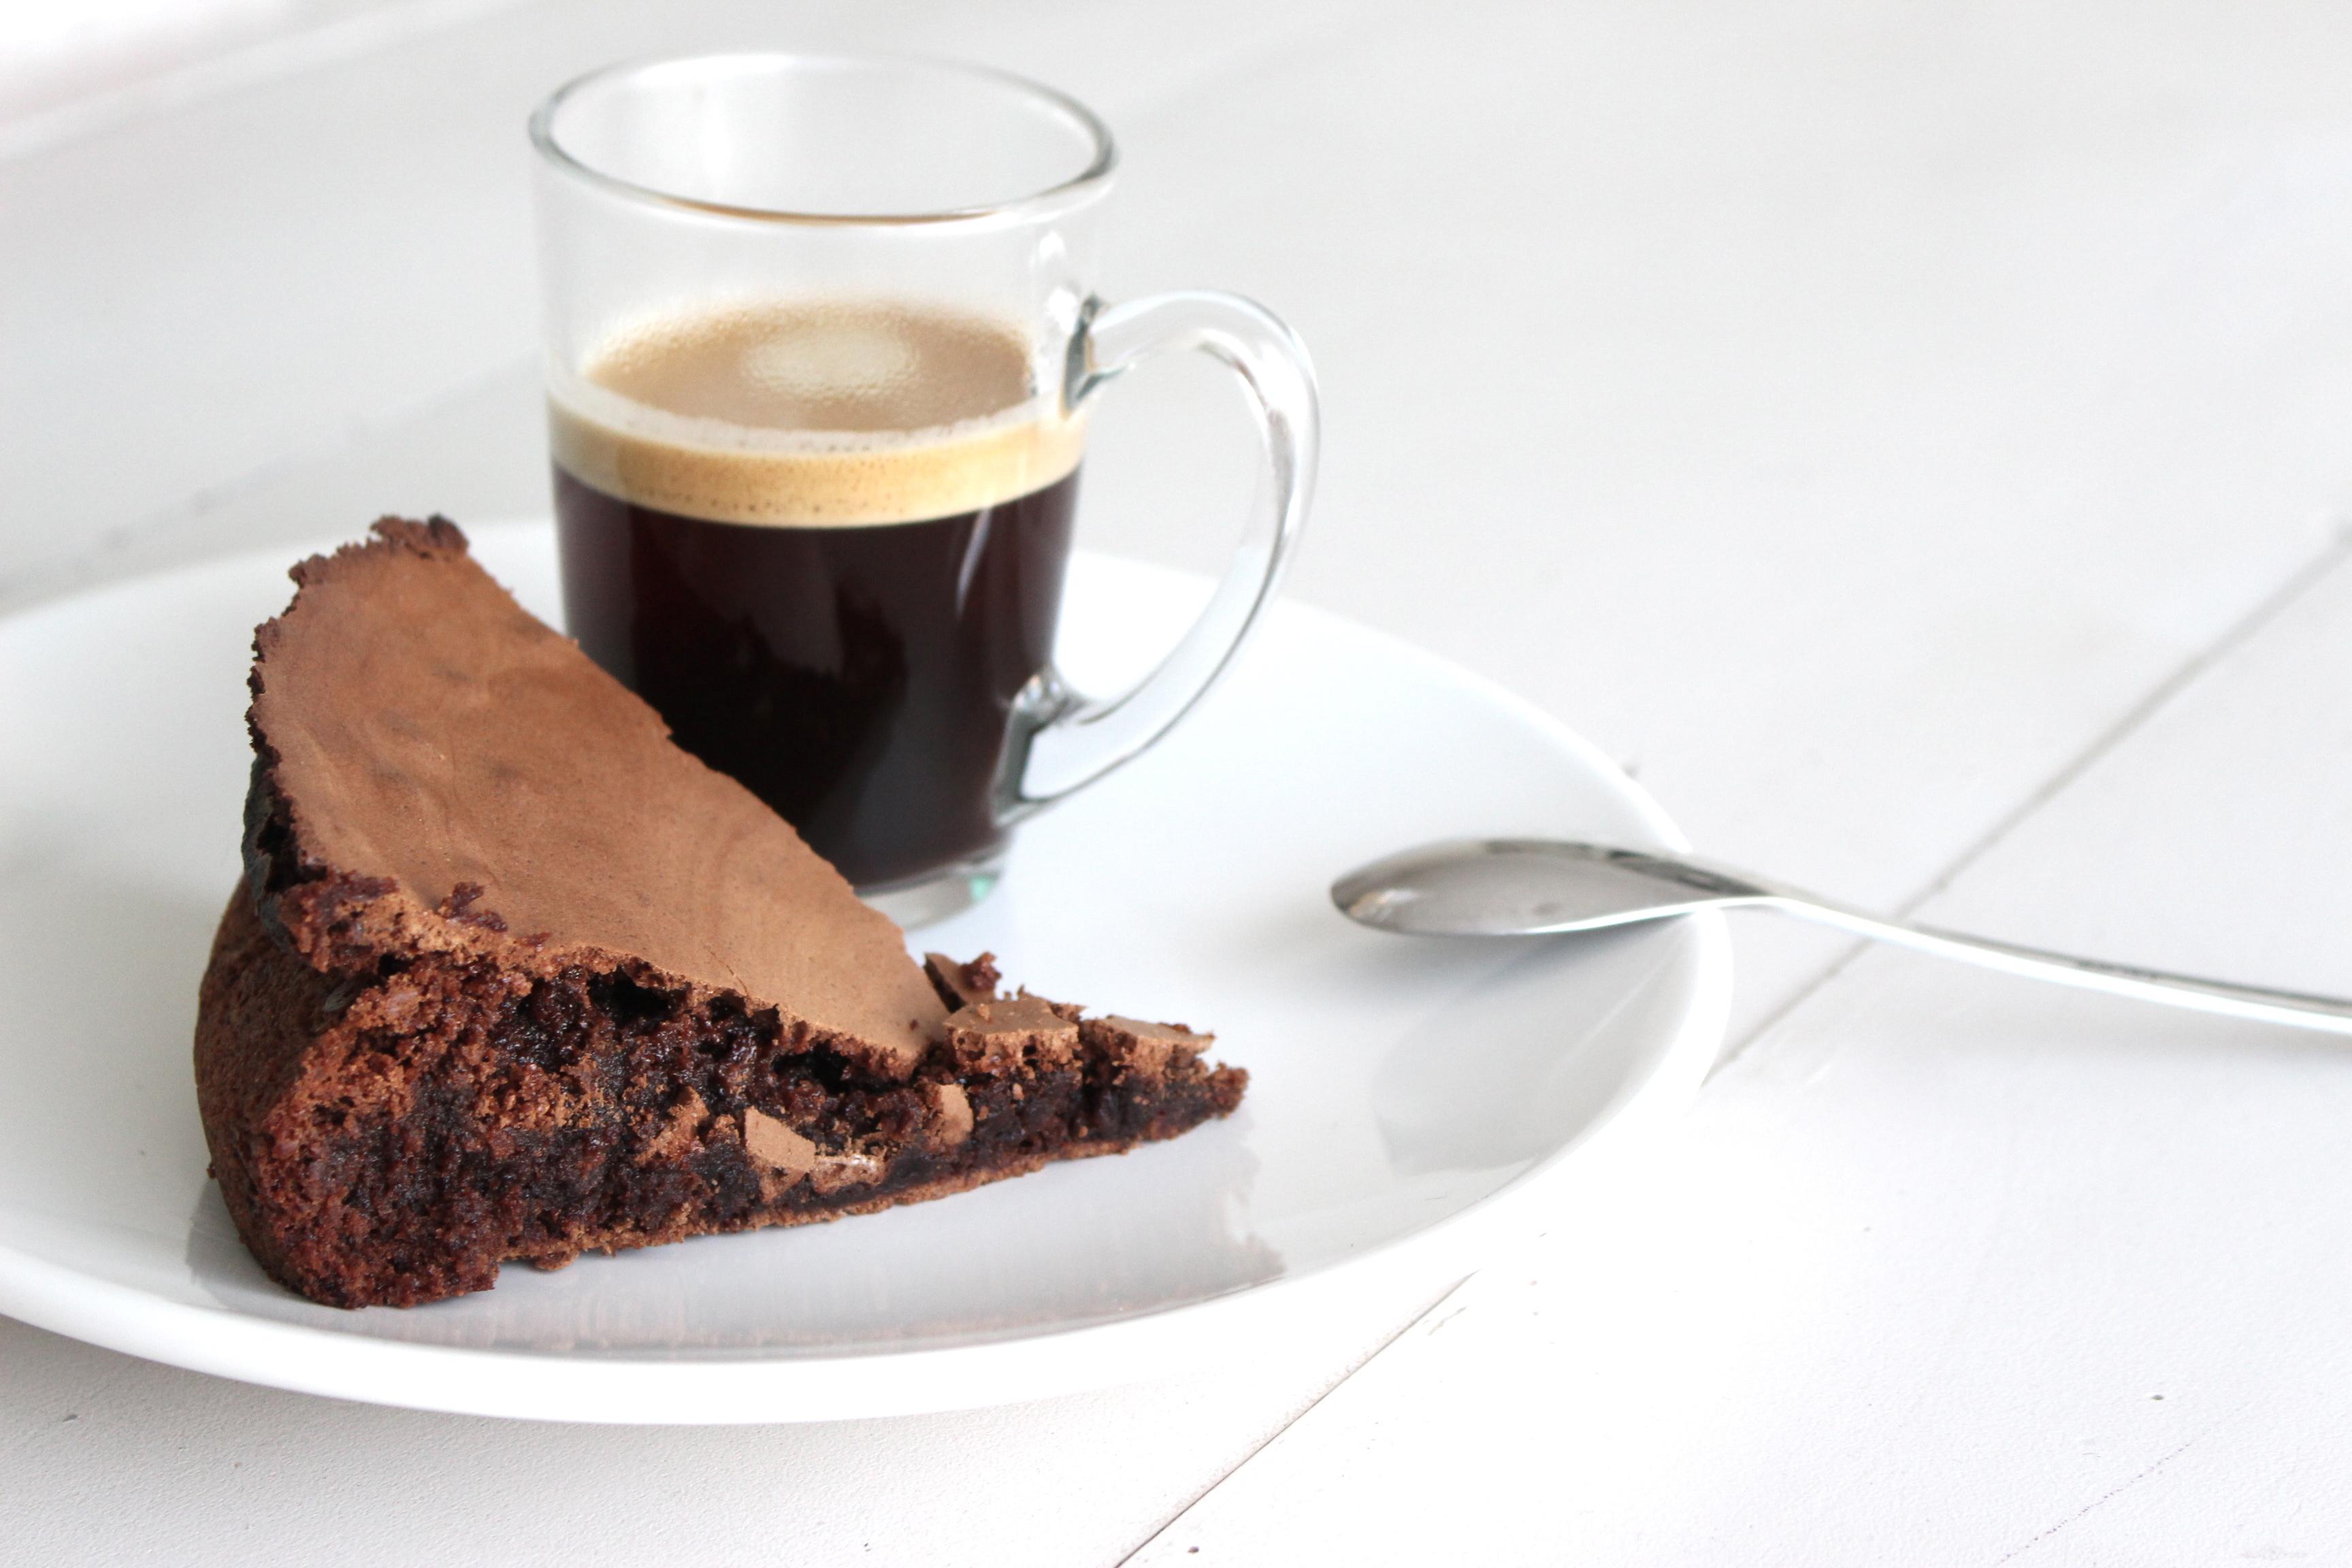 gâteau au chocolat aurélie Malau